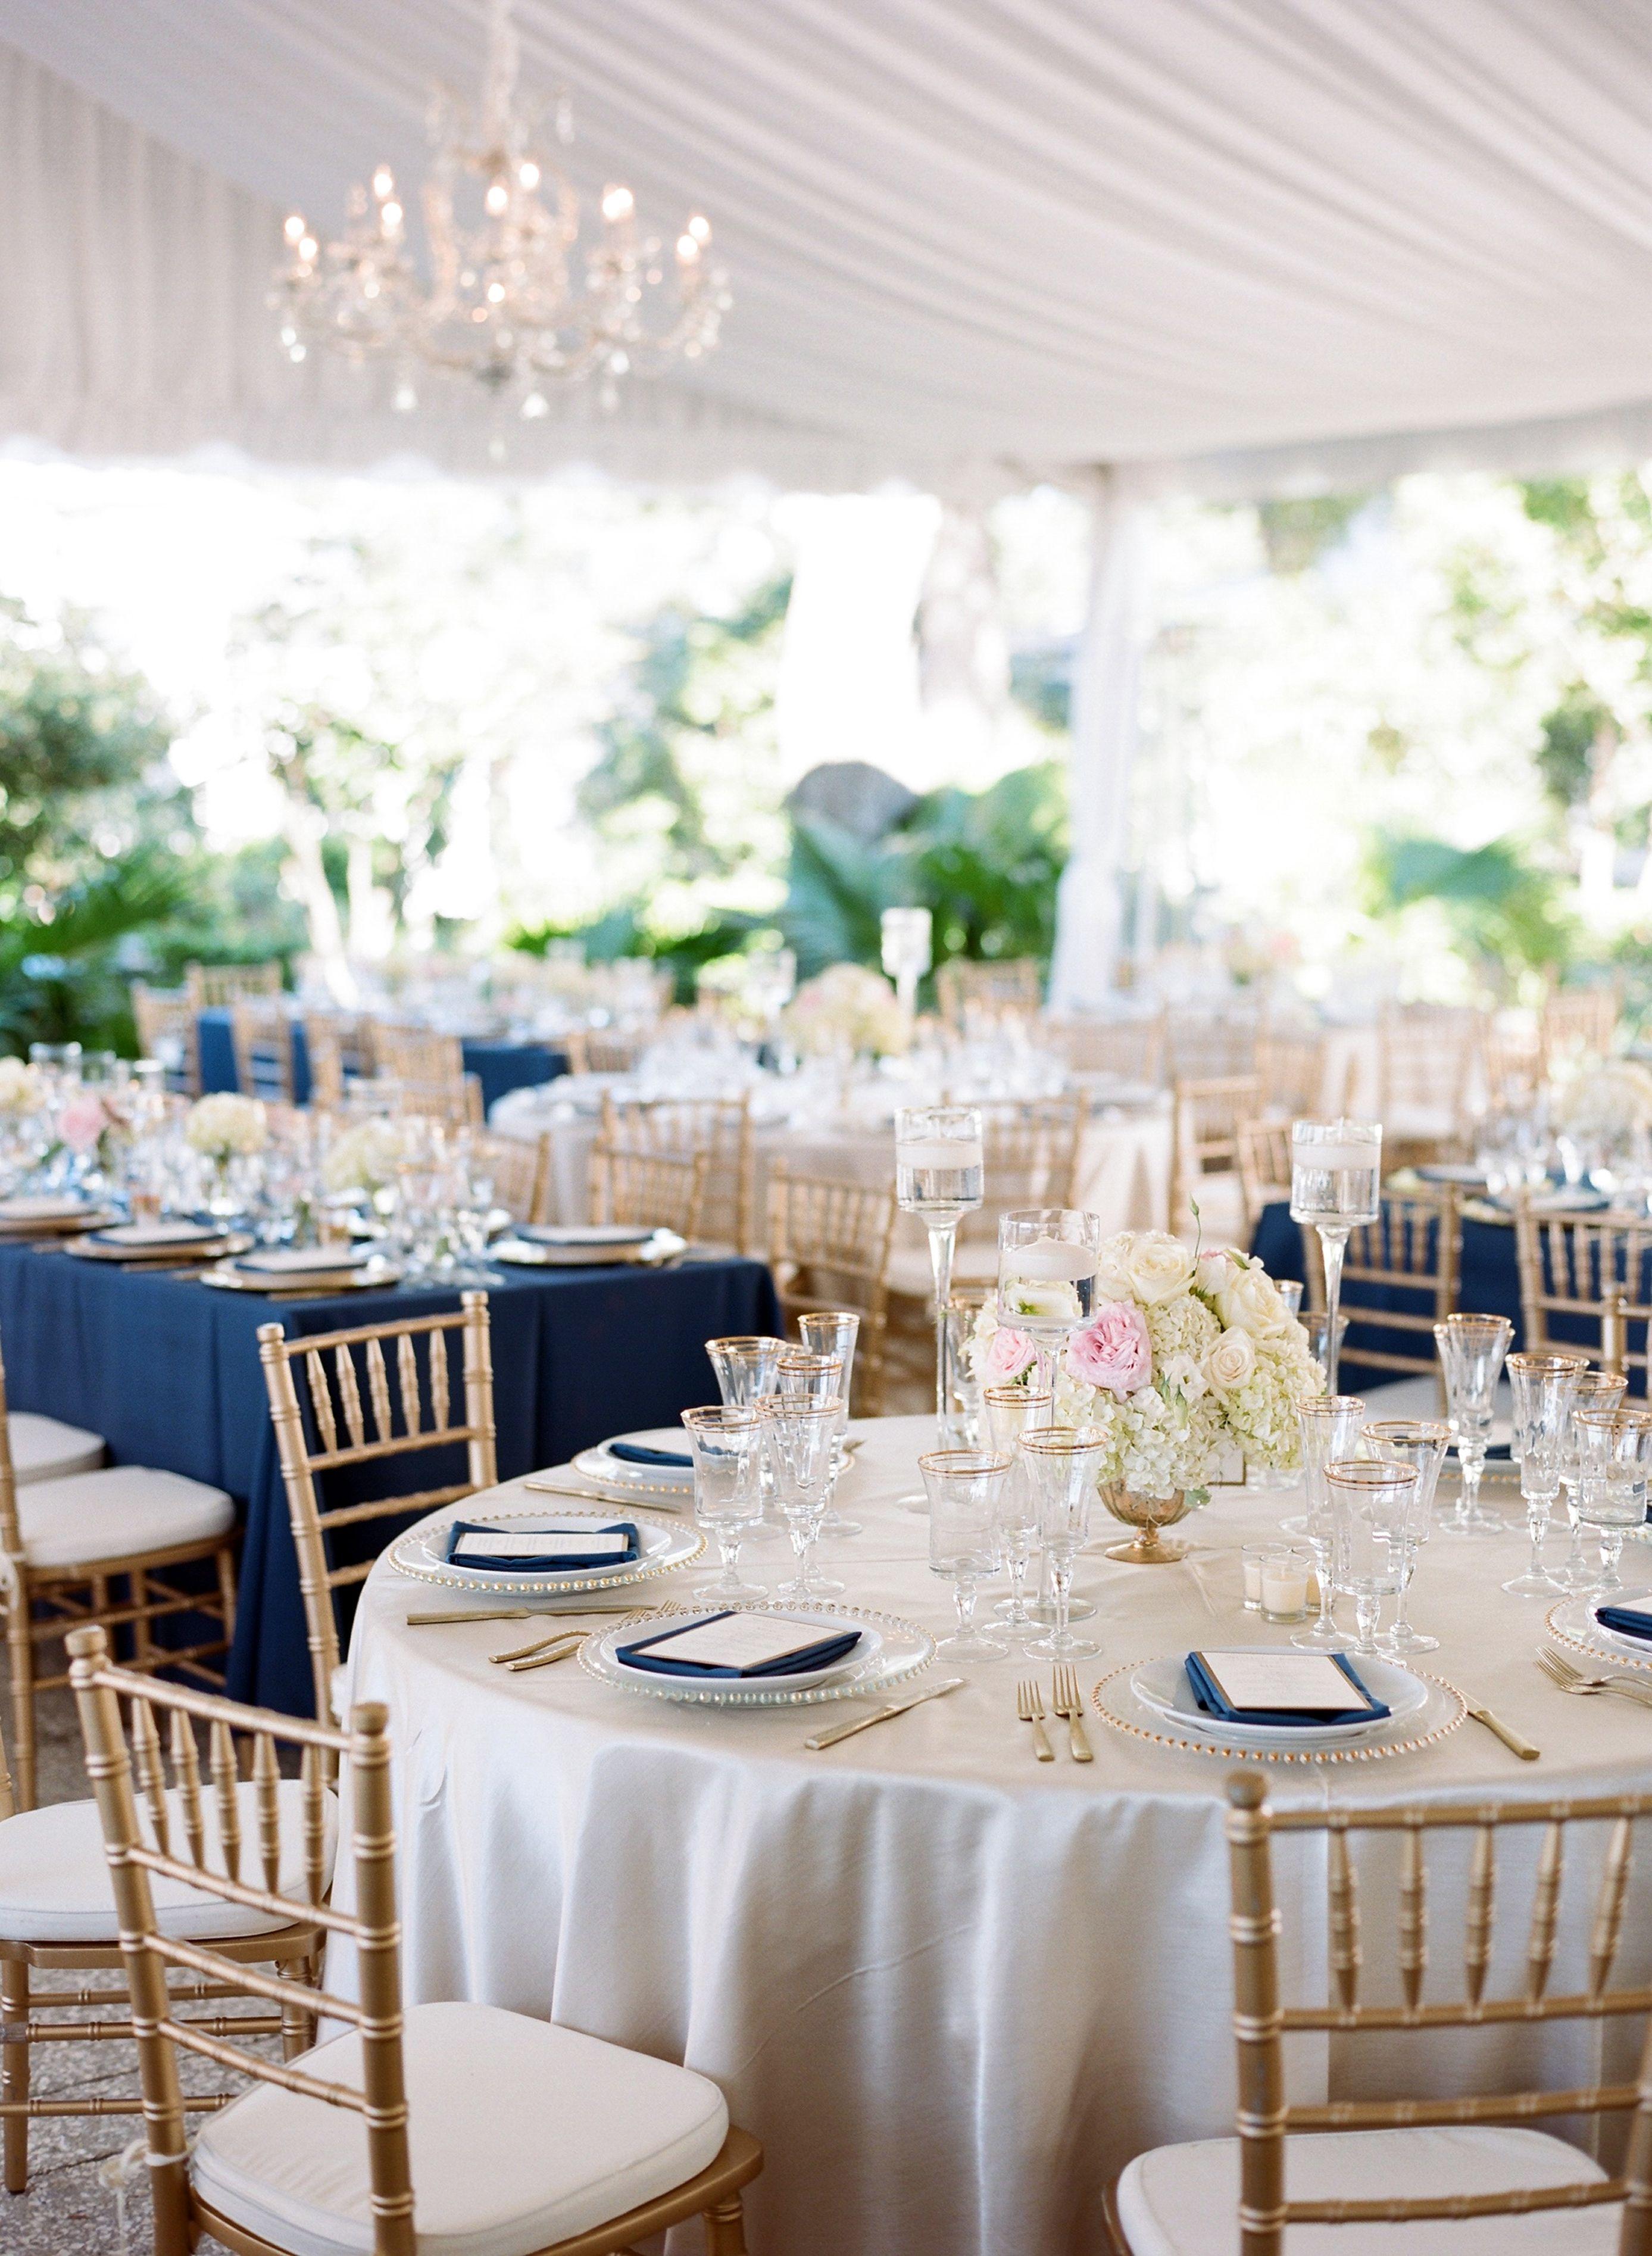 Matrimonio en azul marino y dorado boda 2018